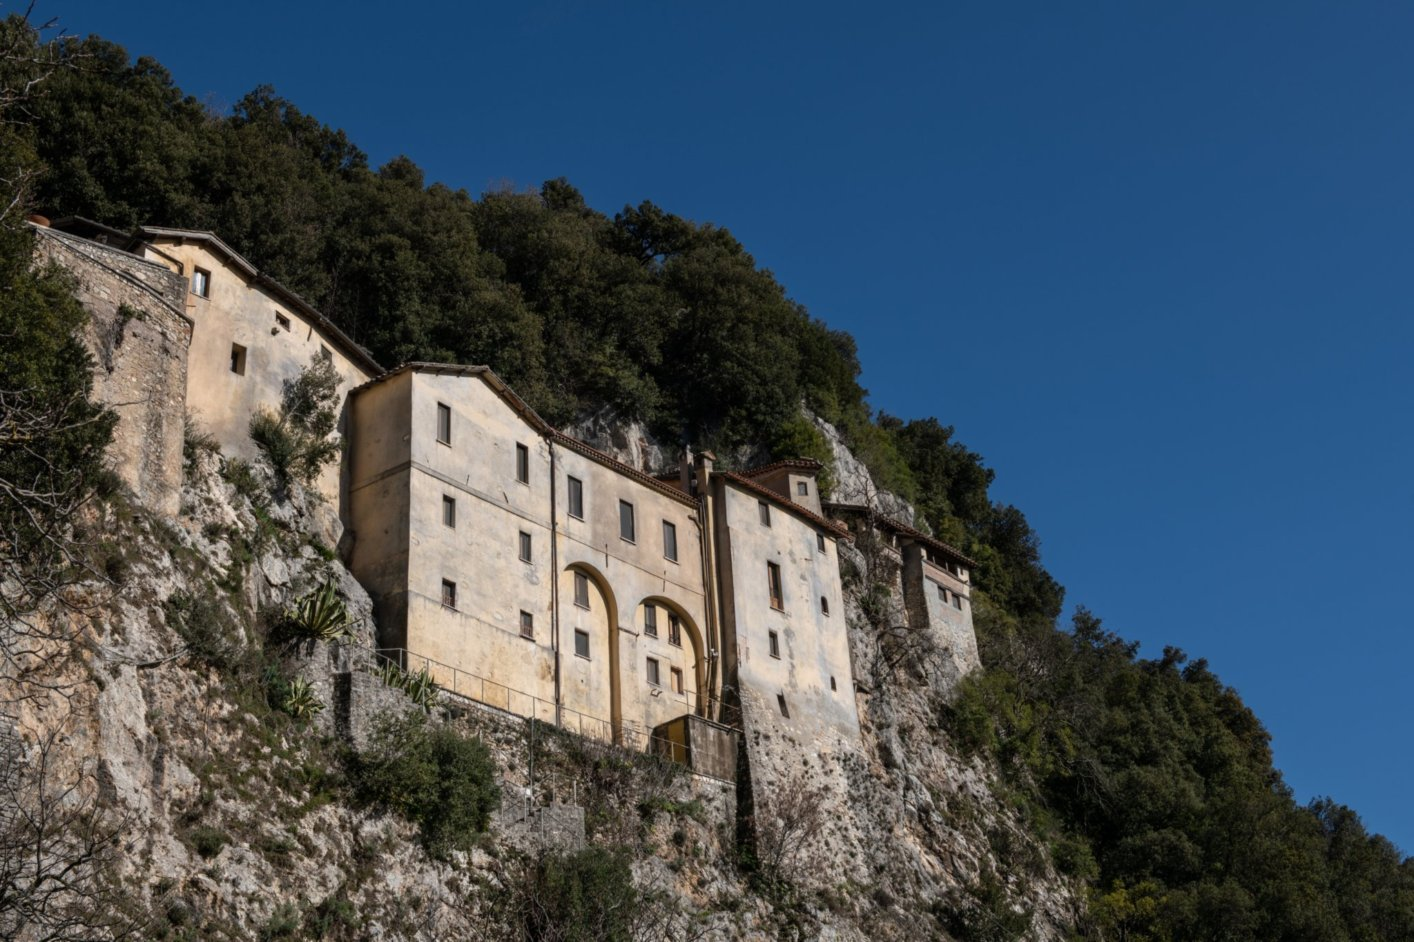 San Francesco, la Valle Santa e il primo presepe.